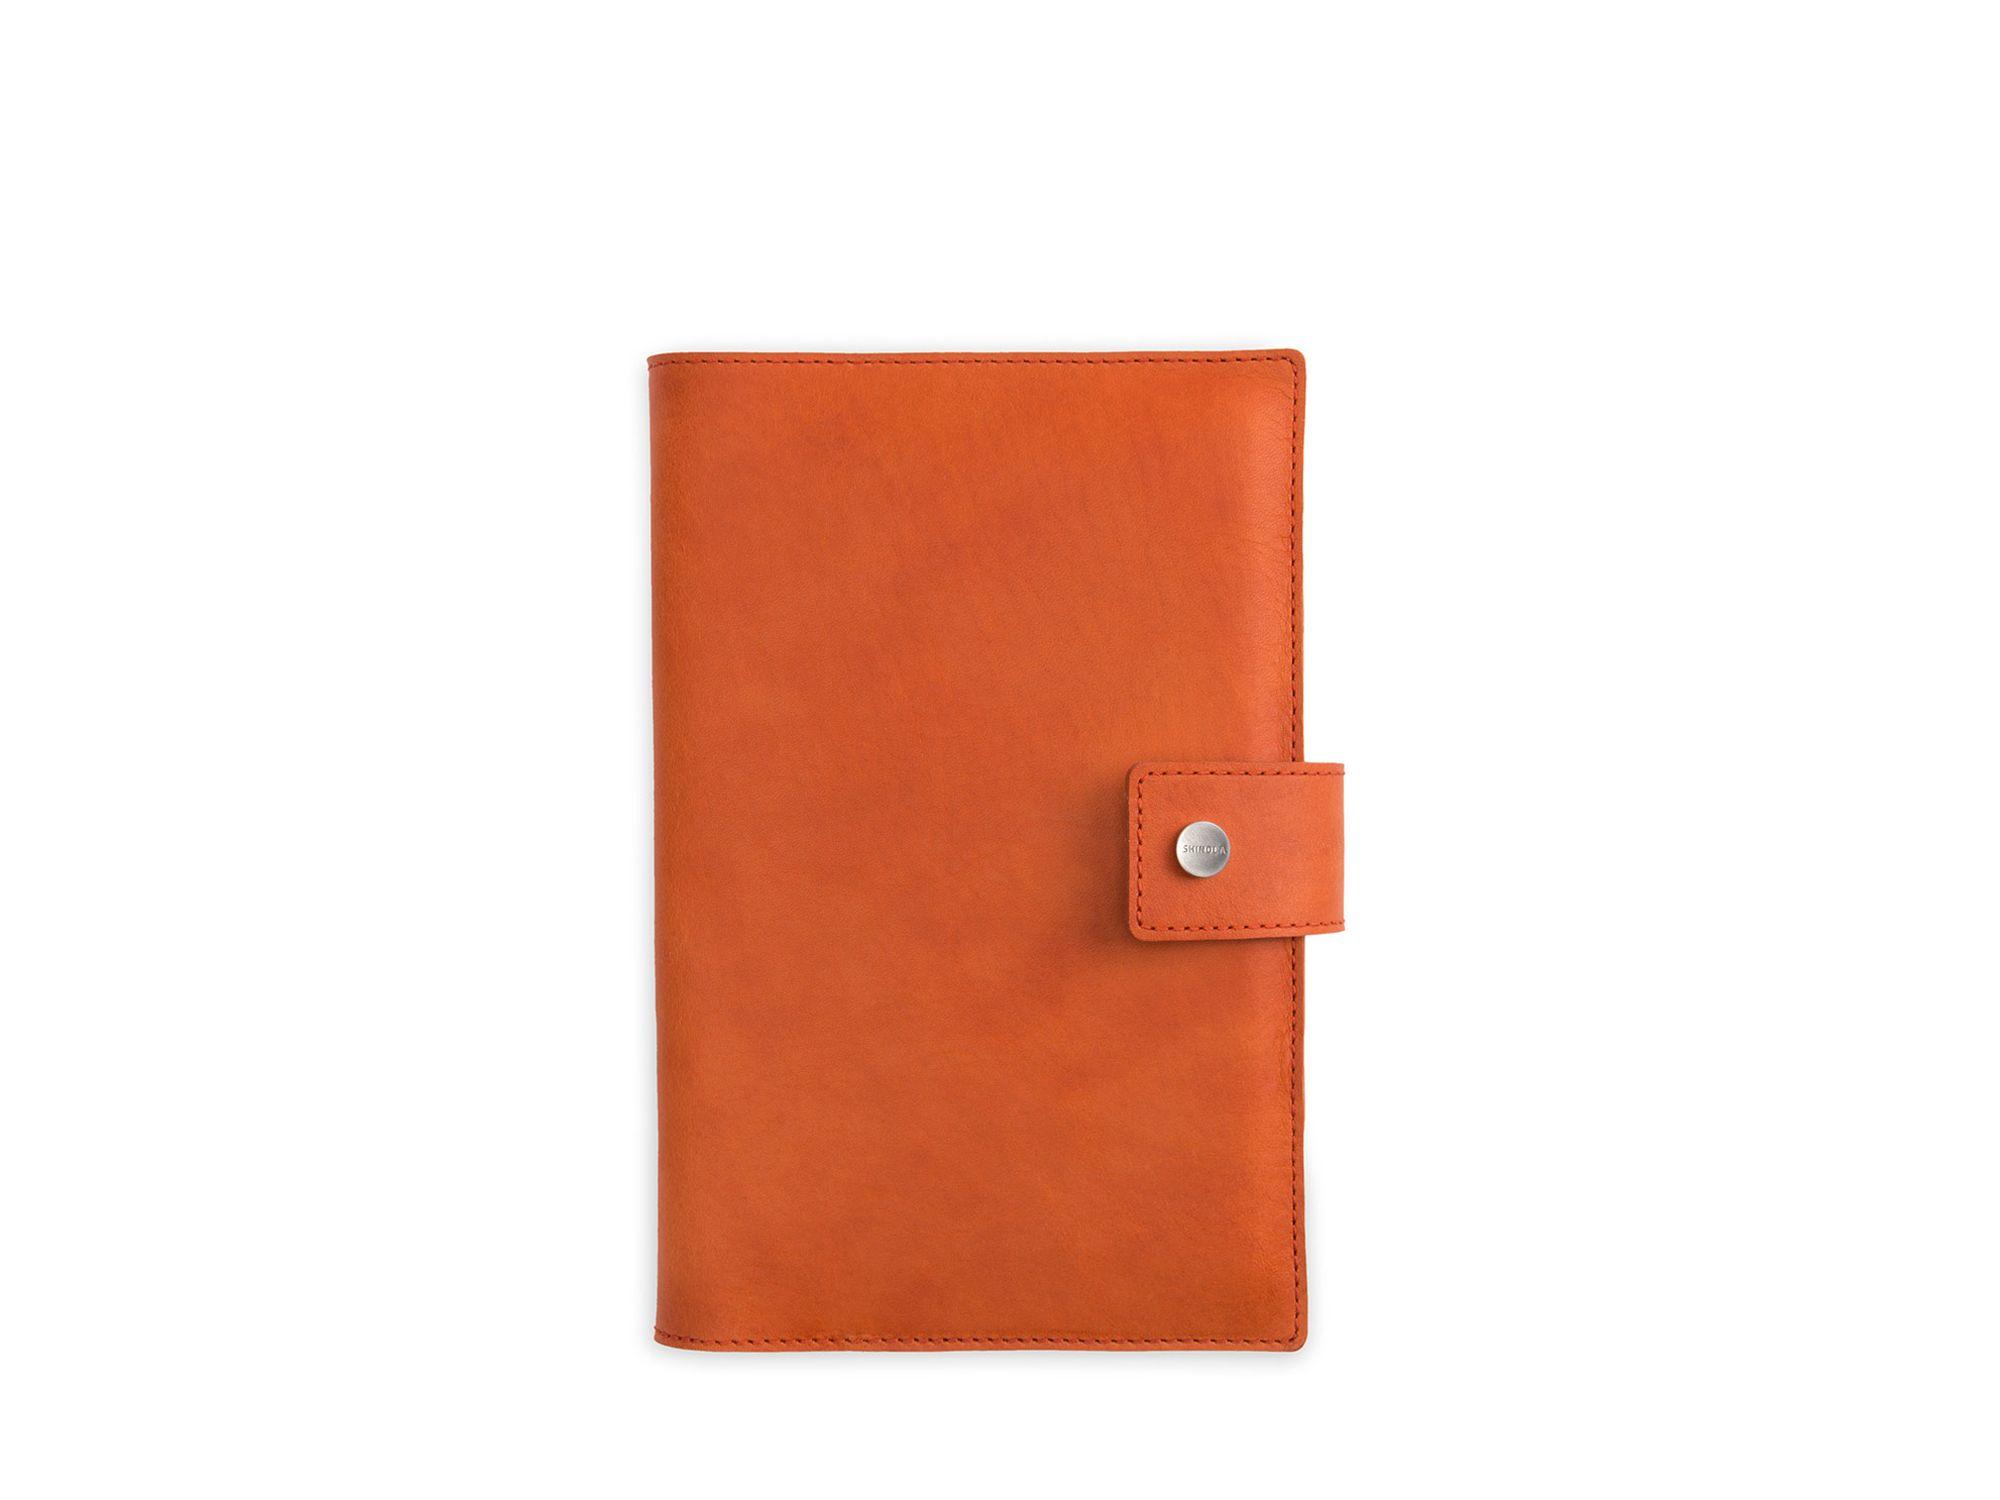 linen fabric properties journals pdf